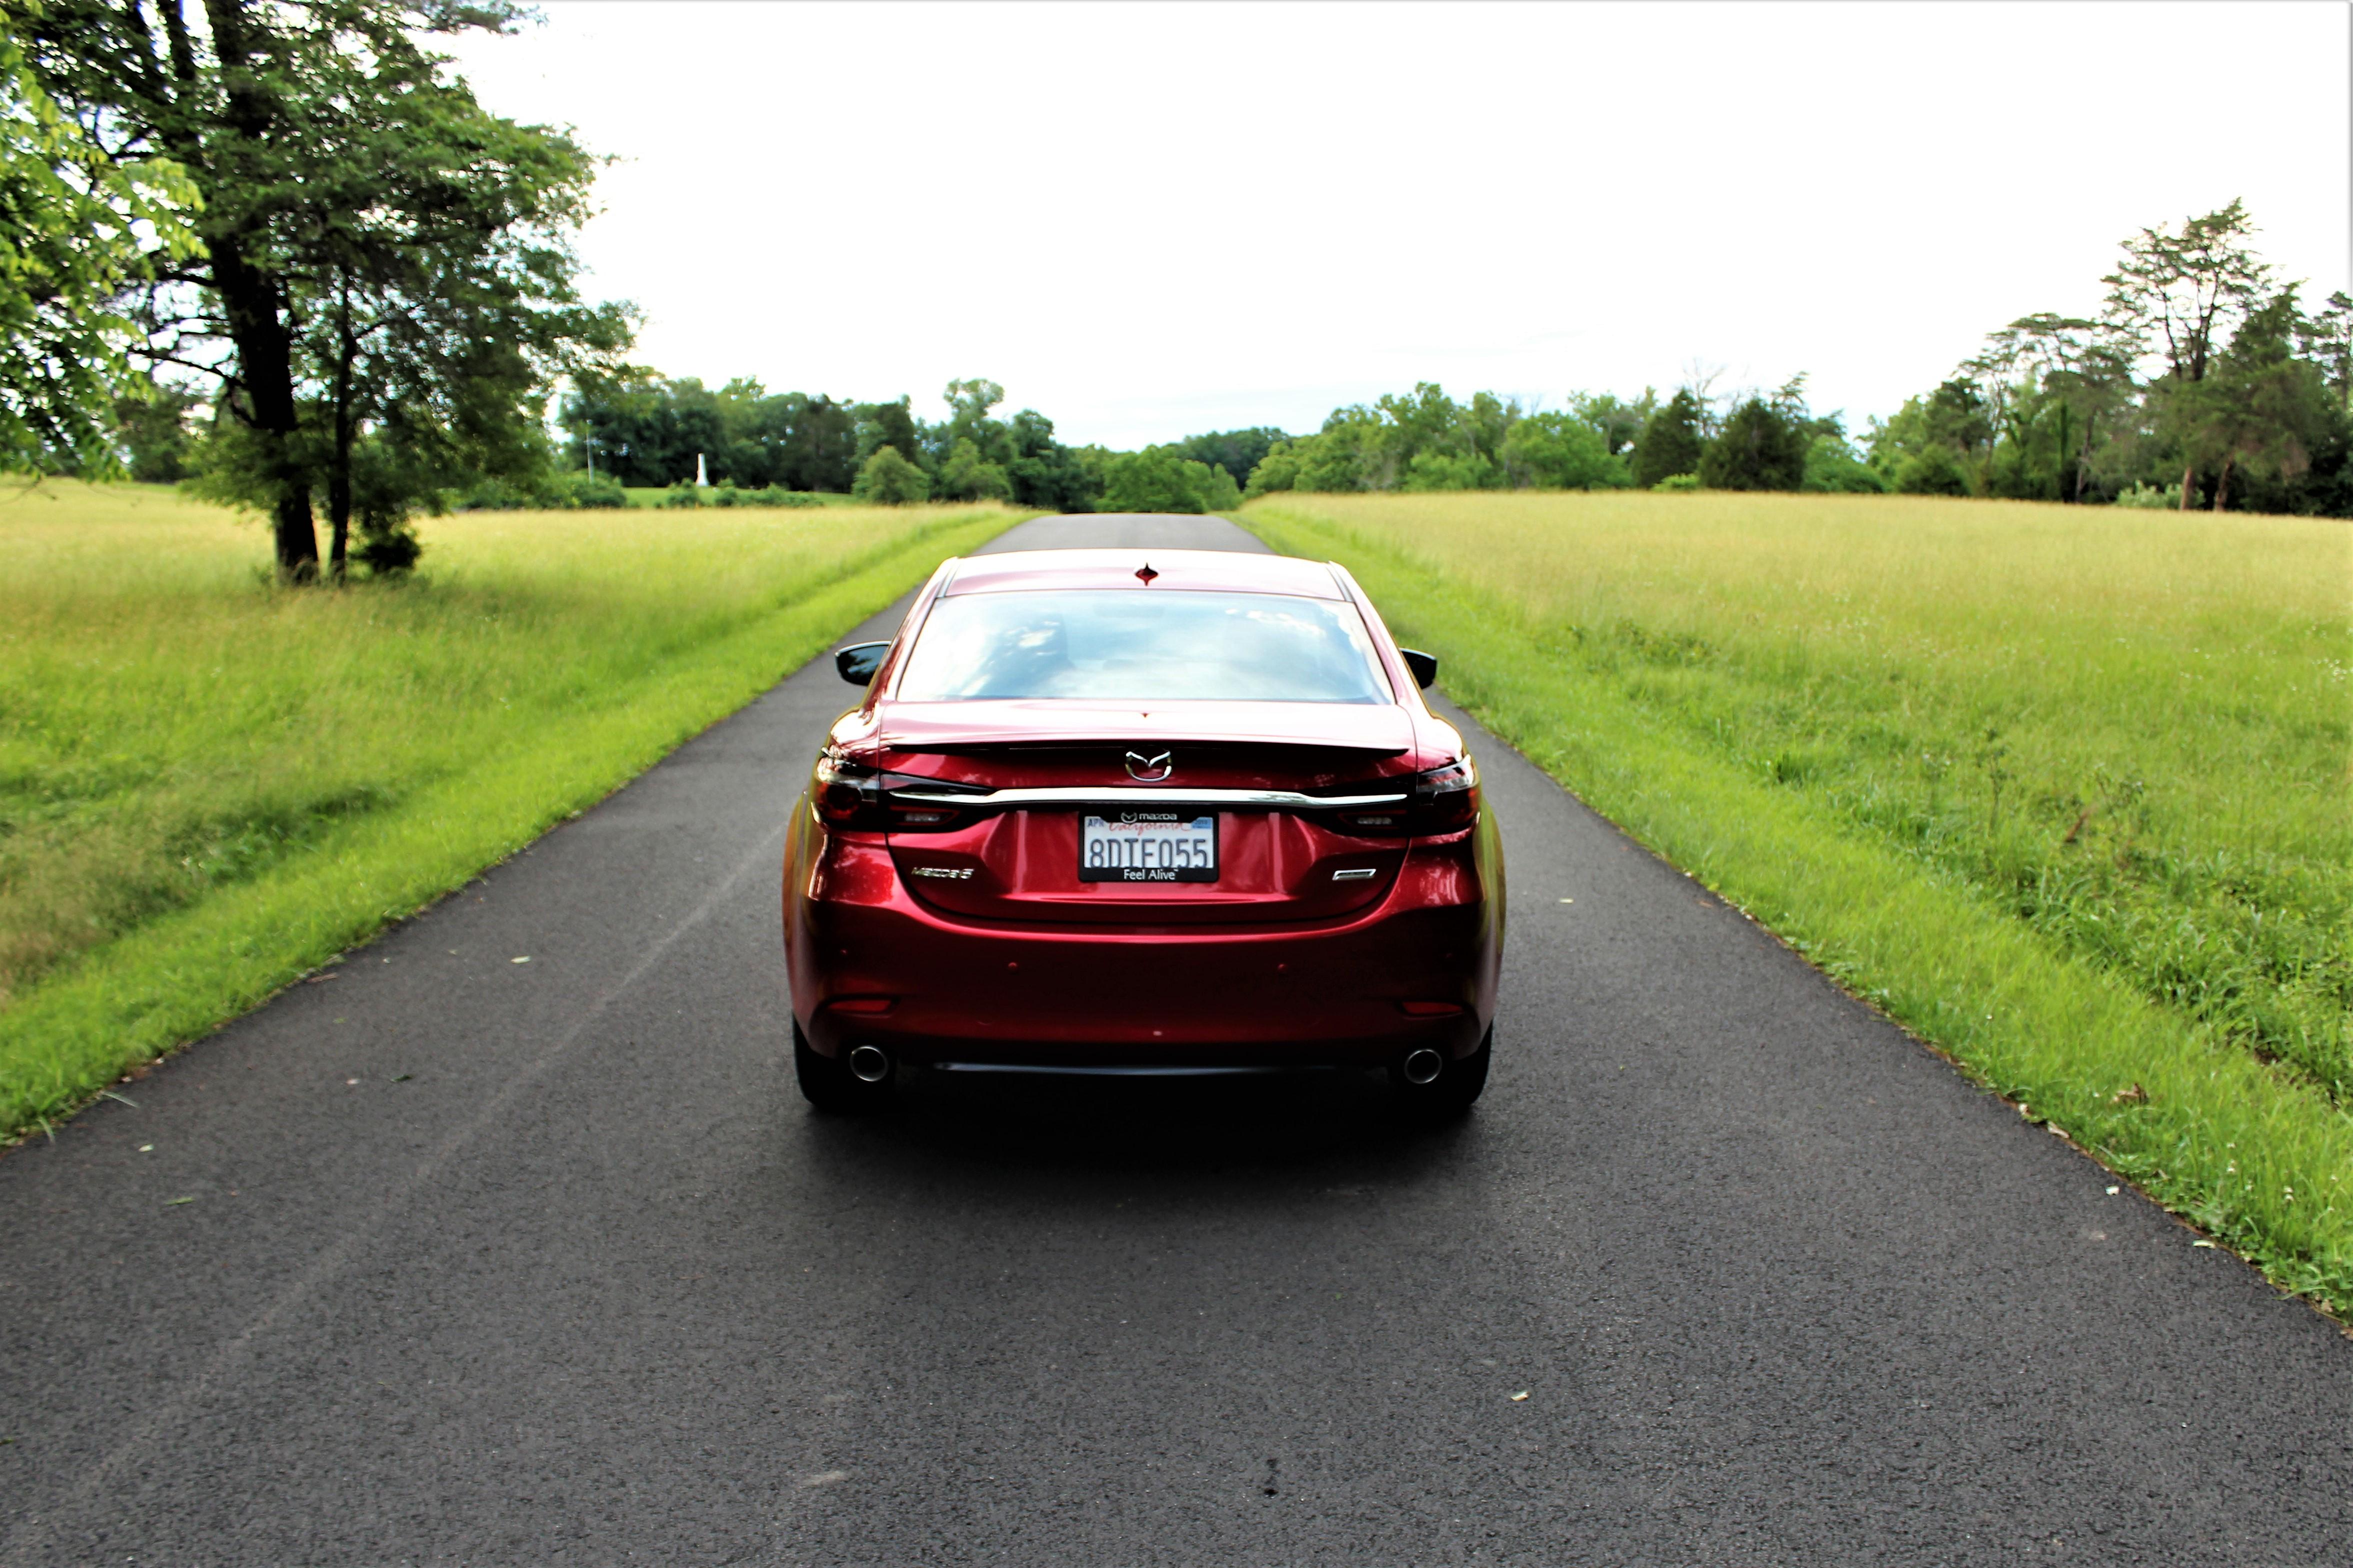 Mazda-6-Rear-Colonial-Roads